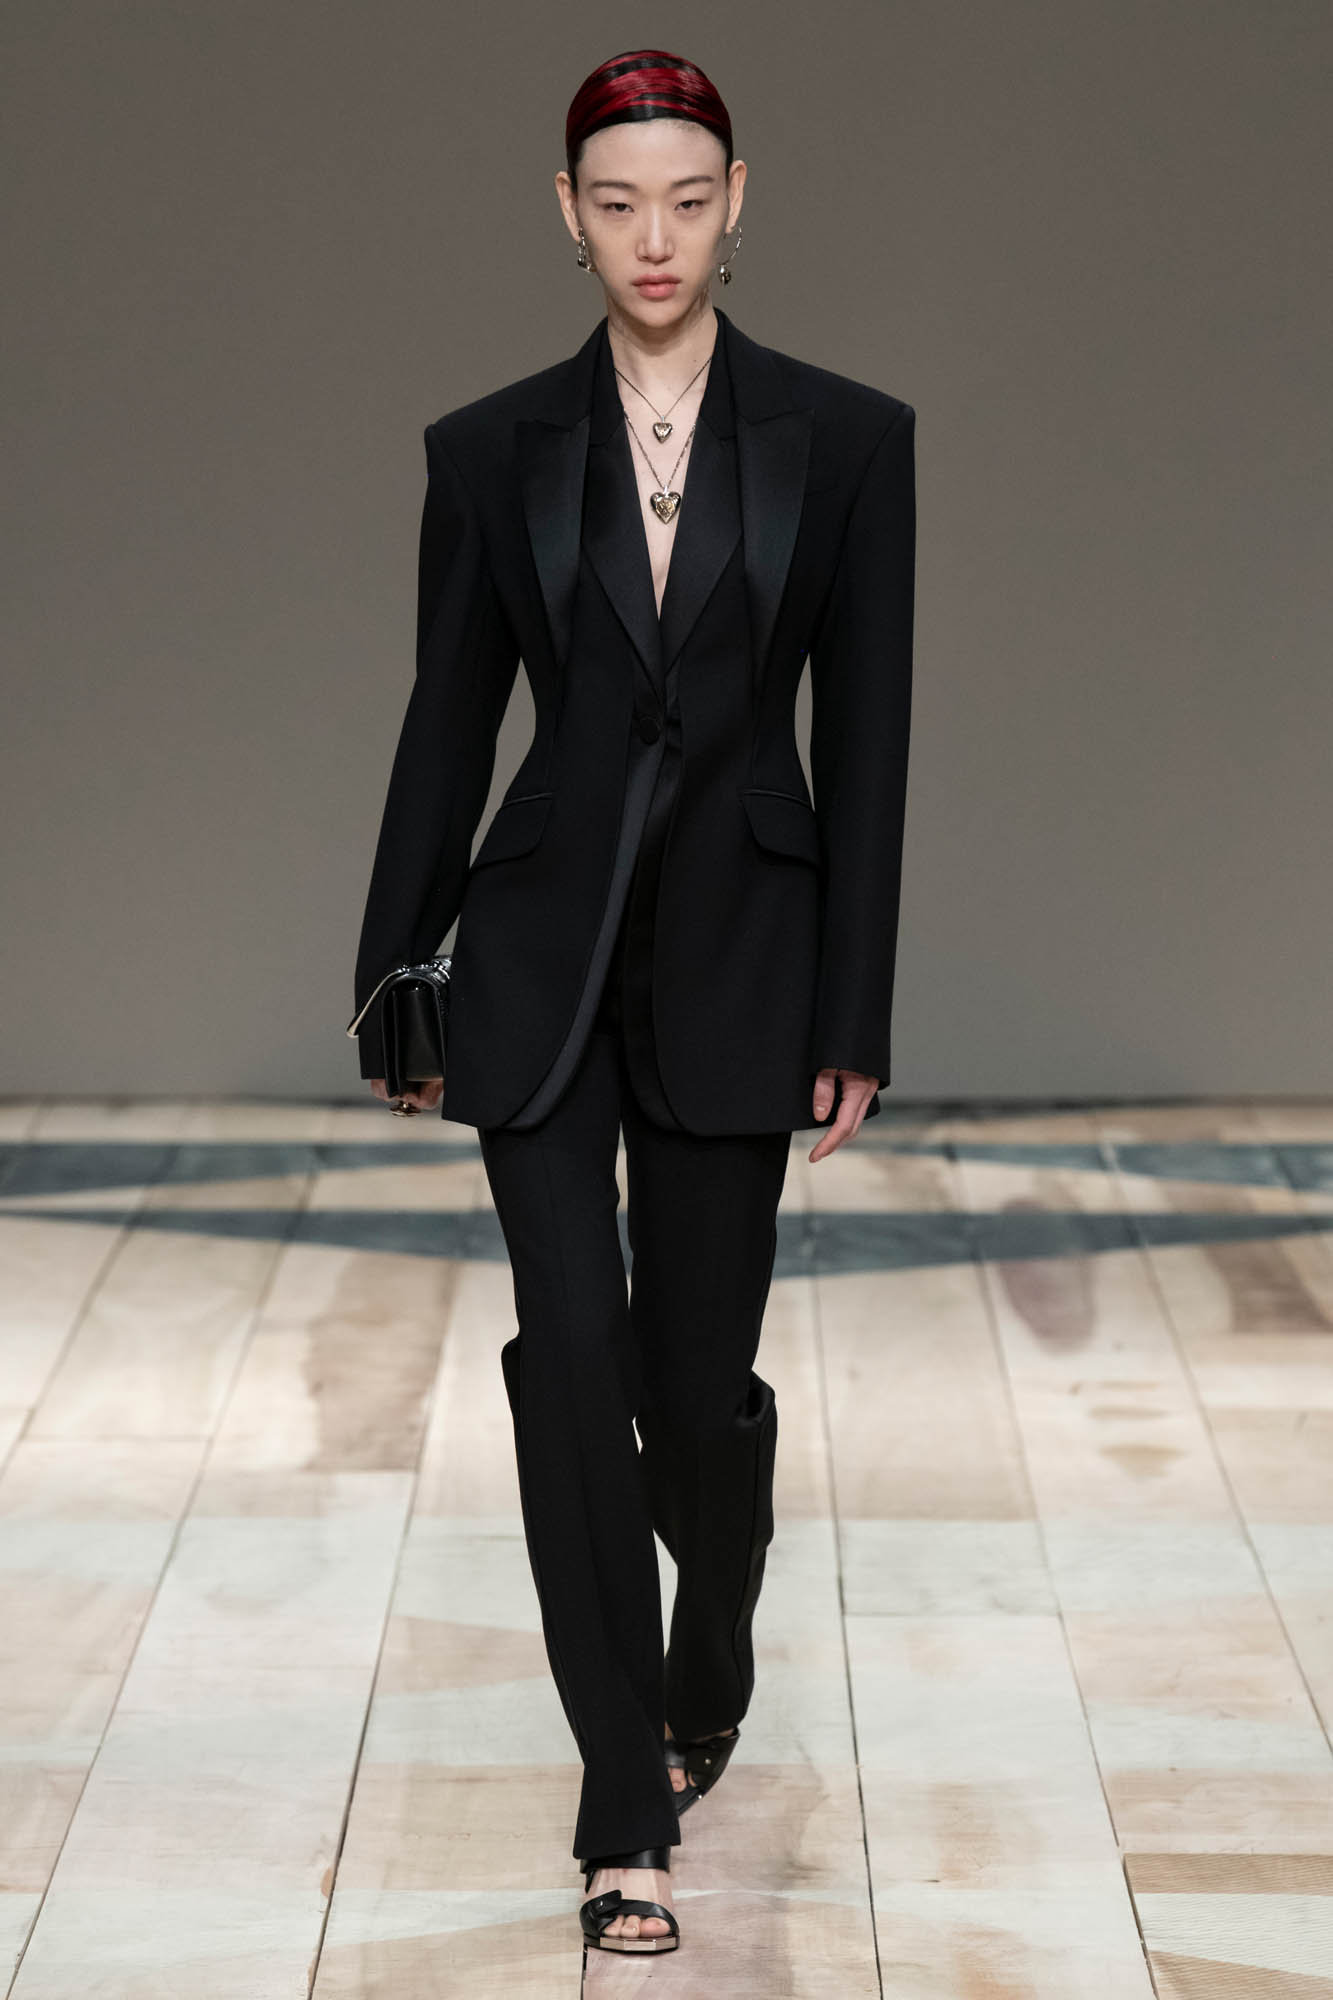 Catwalk Alexander McQueen Woman Fashion Show Winter 2020